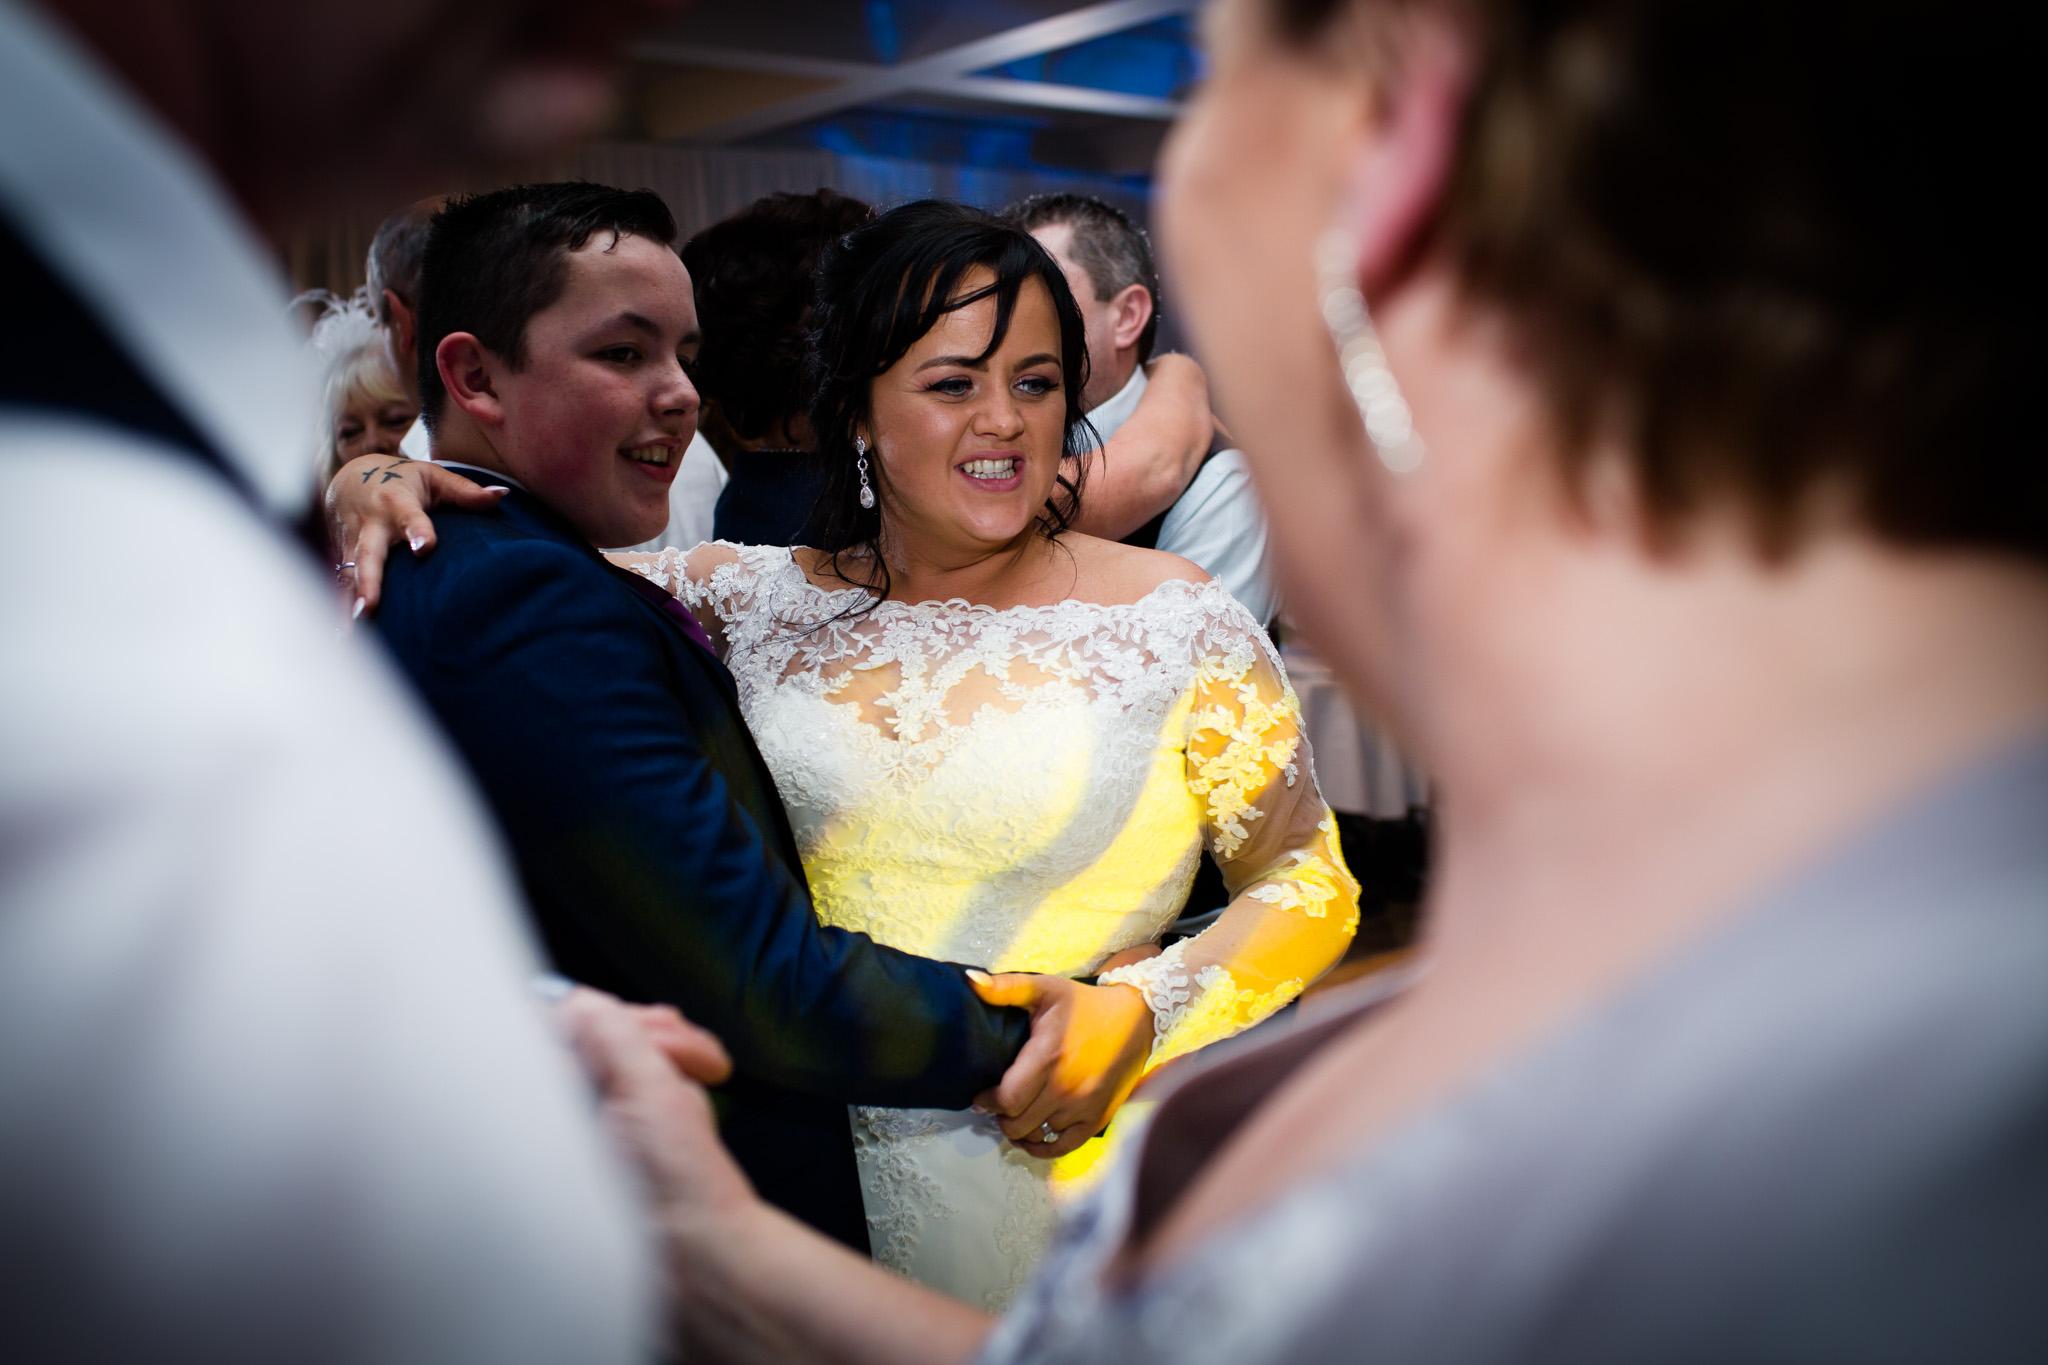 Mark_Barnes_Northern_Ireland_Wedding_Photography_Marine_hotel_ballycastle_Wedding_Photography_Janet&Darren-43.jpg